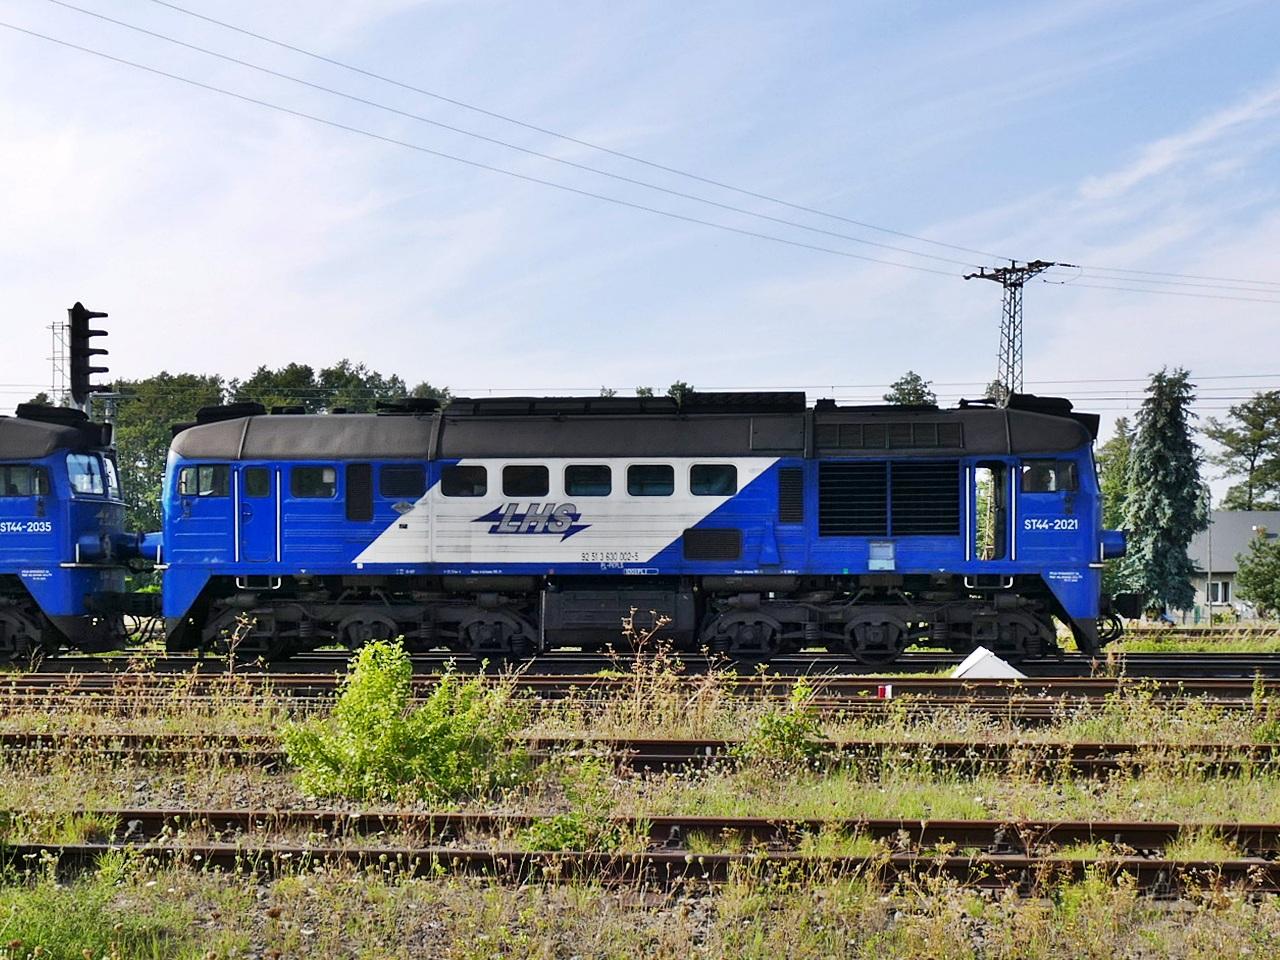 st44-2021.JPG